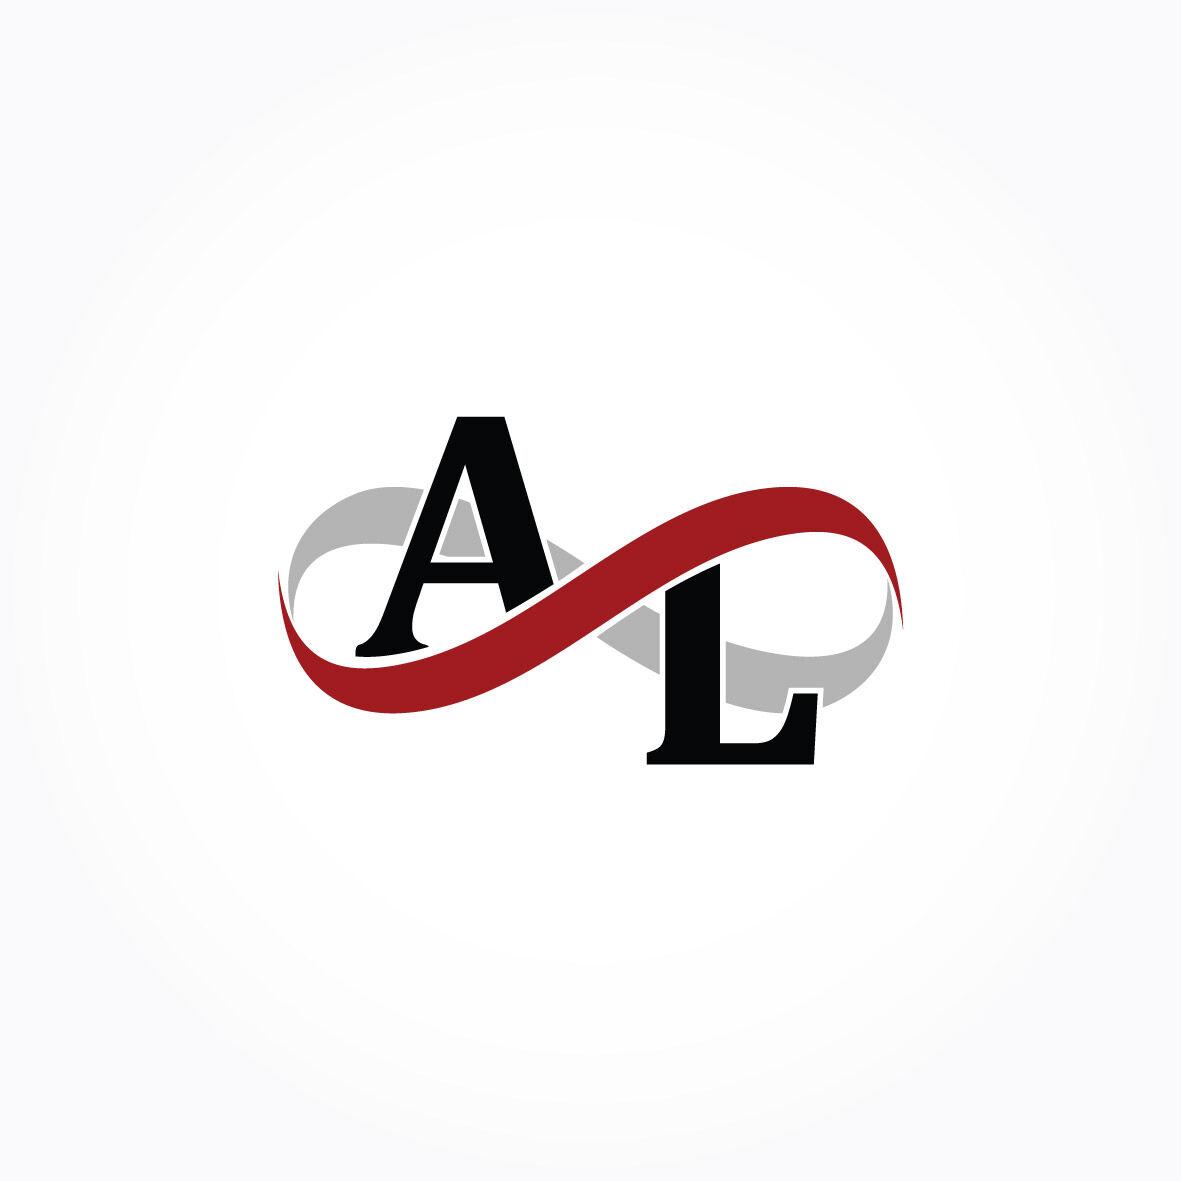 Al Infinity Logo Monogram By Vectorseller Thehungryjpeg Com